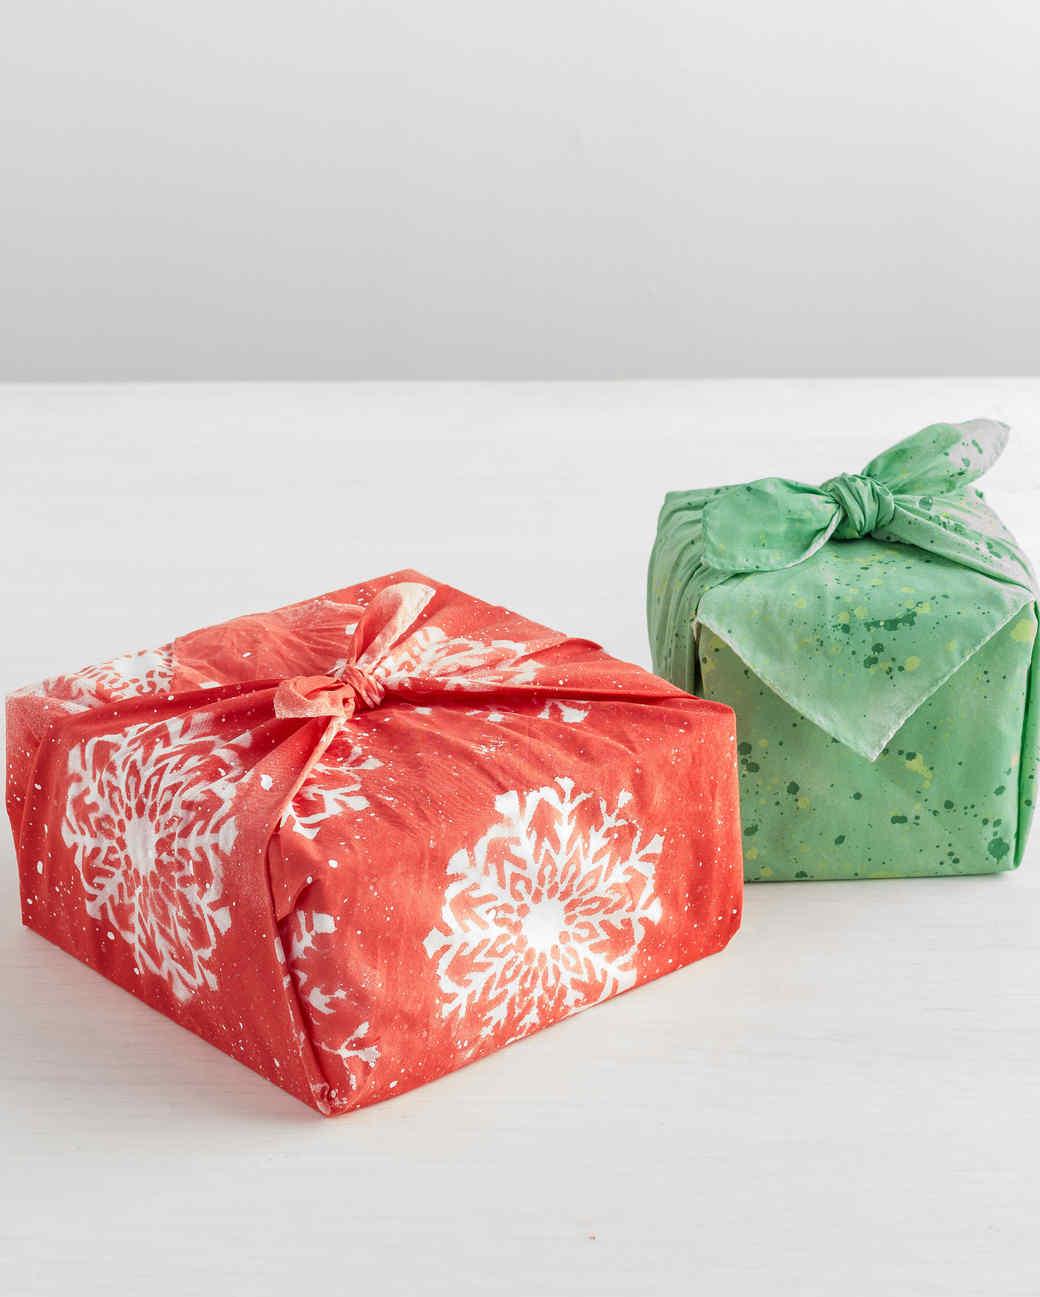 MS crafts fabric wrap